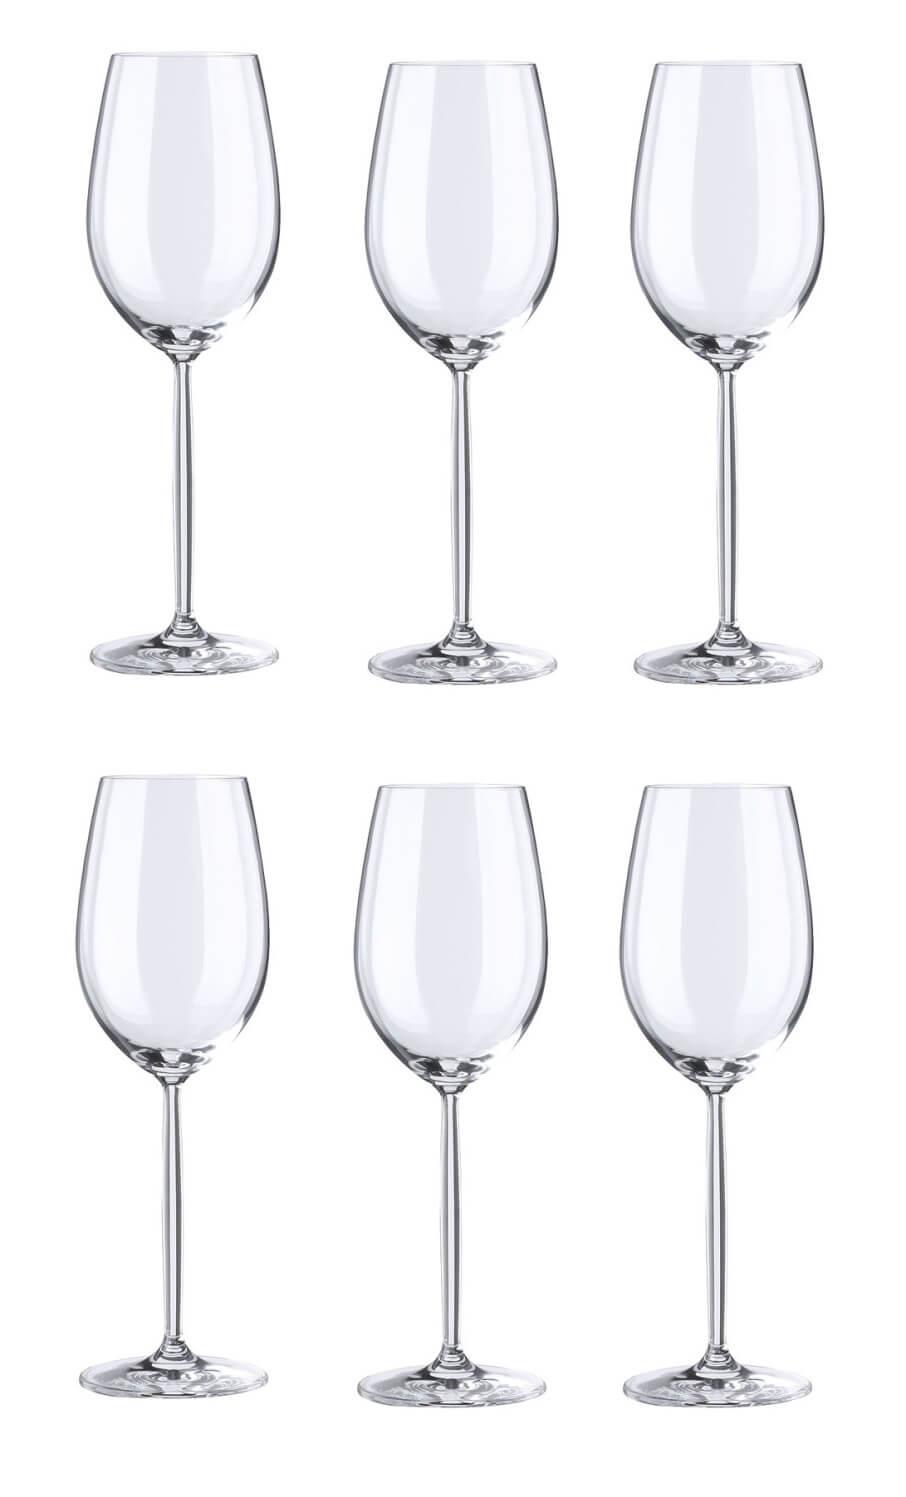 Онлайн каталог PROMENU: Набор бокалов для белого вина Schott Zwiesel Diva, объем 0,302 л, 6 шт.                                   104097_6шт